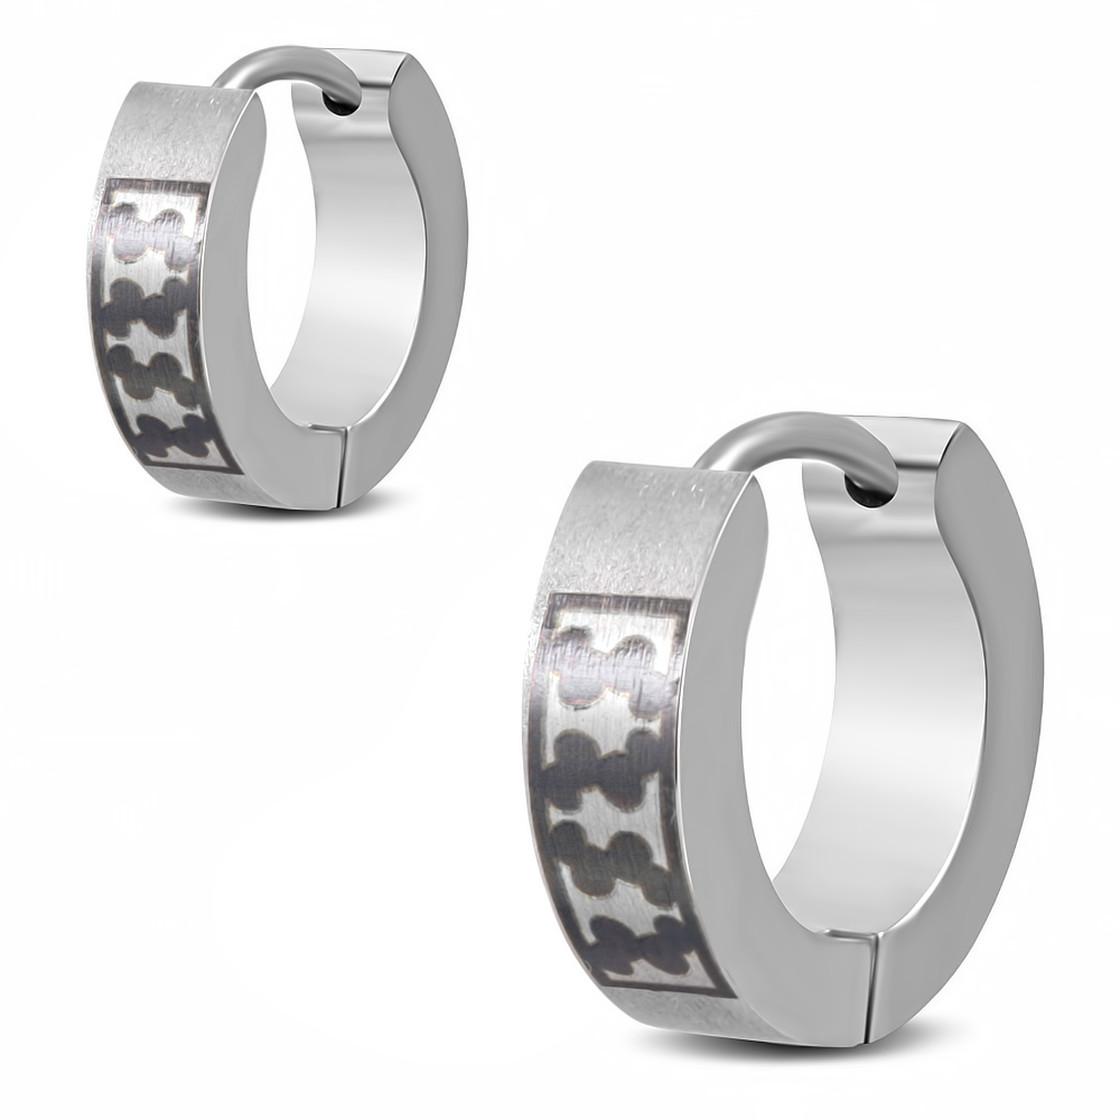 Silberfarben Ohrringe Klappcreolen Damen Edelstahl Schwarz emailiert